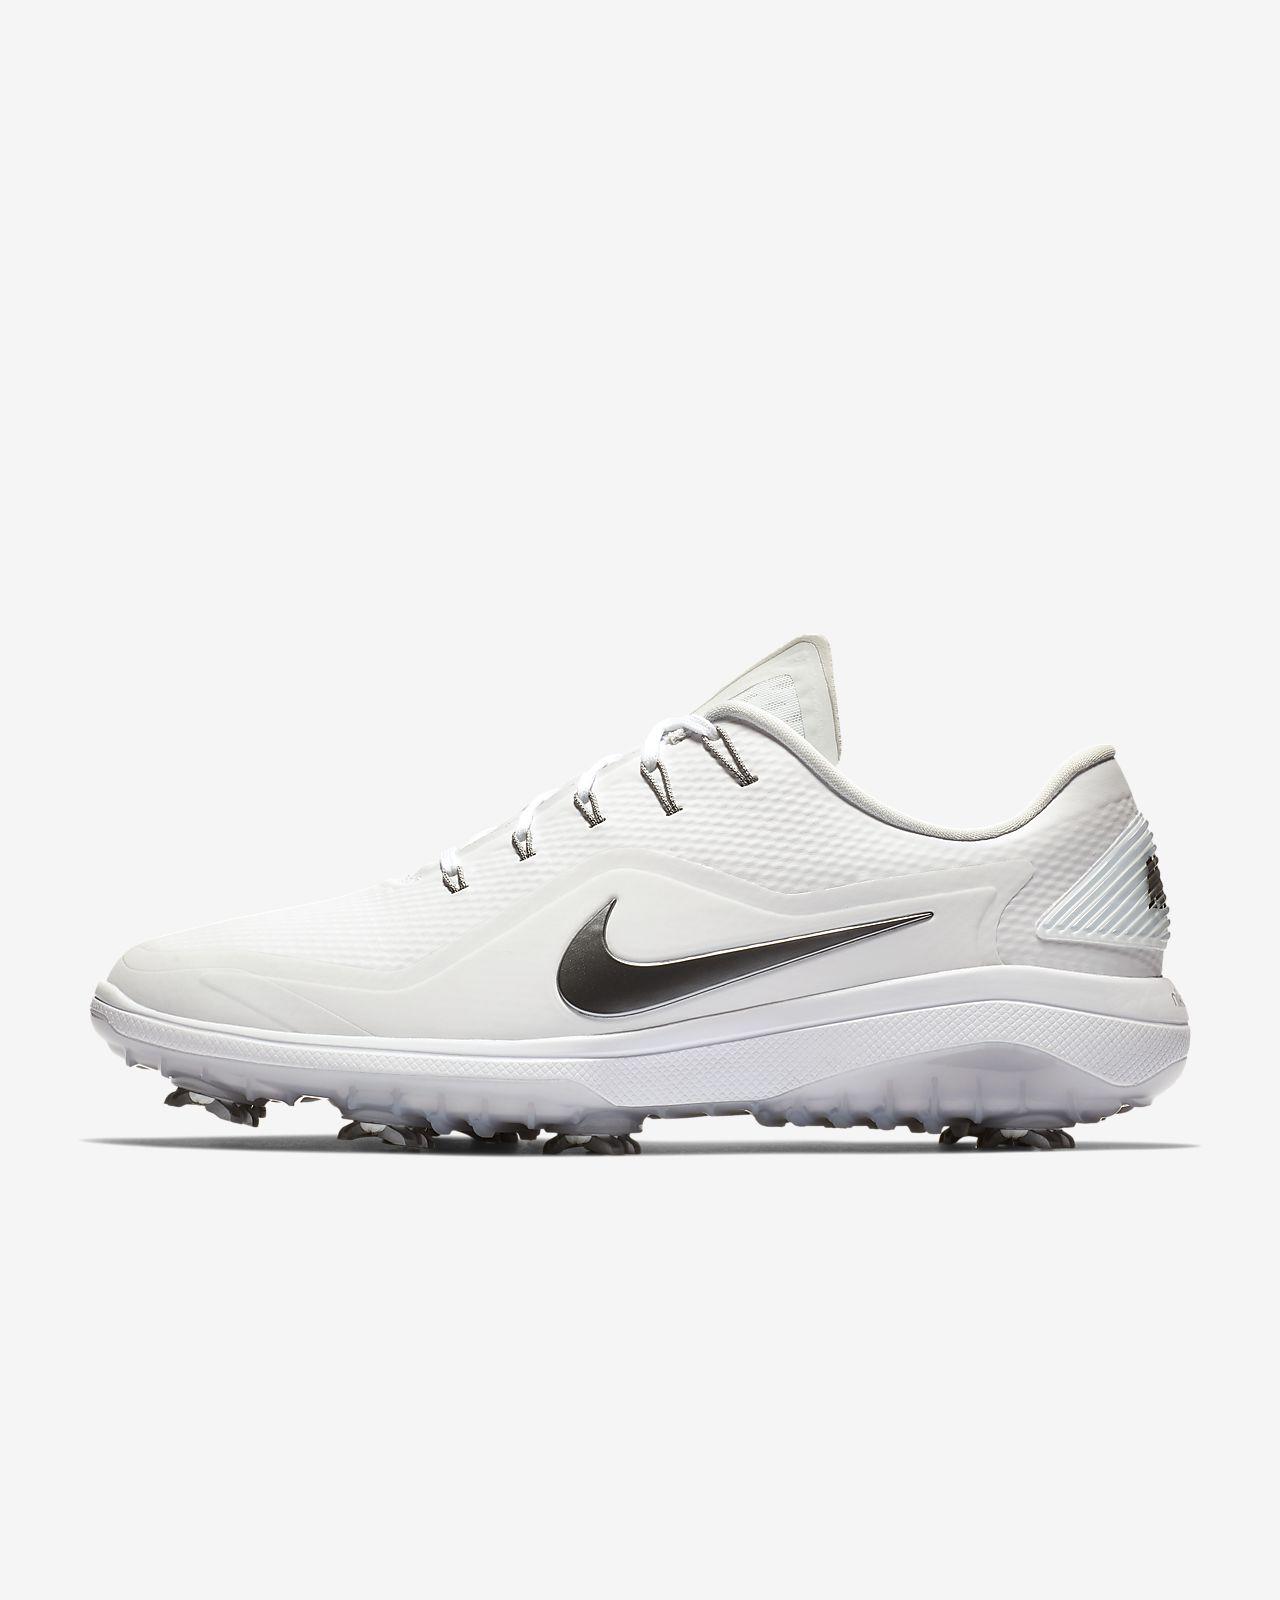 1b60760e3b5 Nike React Vapor 2 Men s Golf Shoe. Nike.com DK